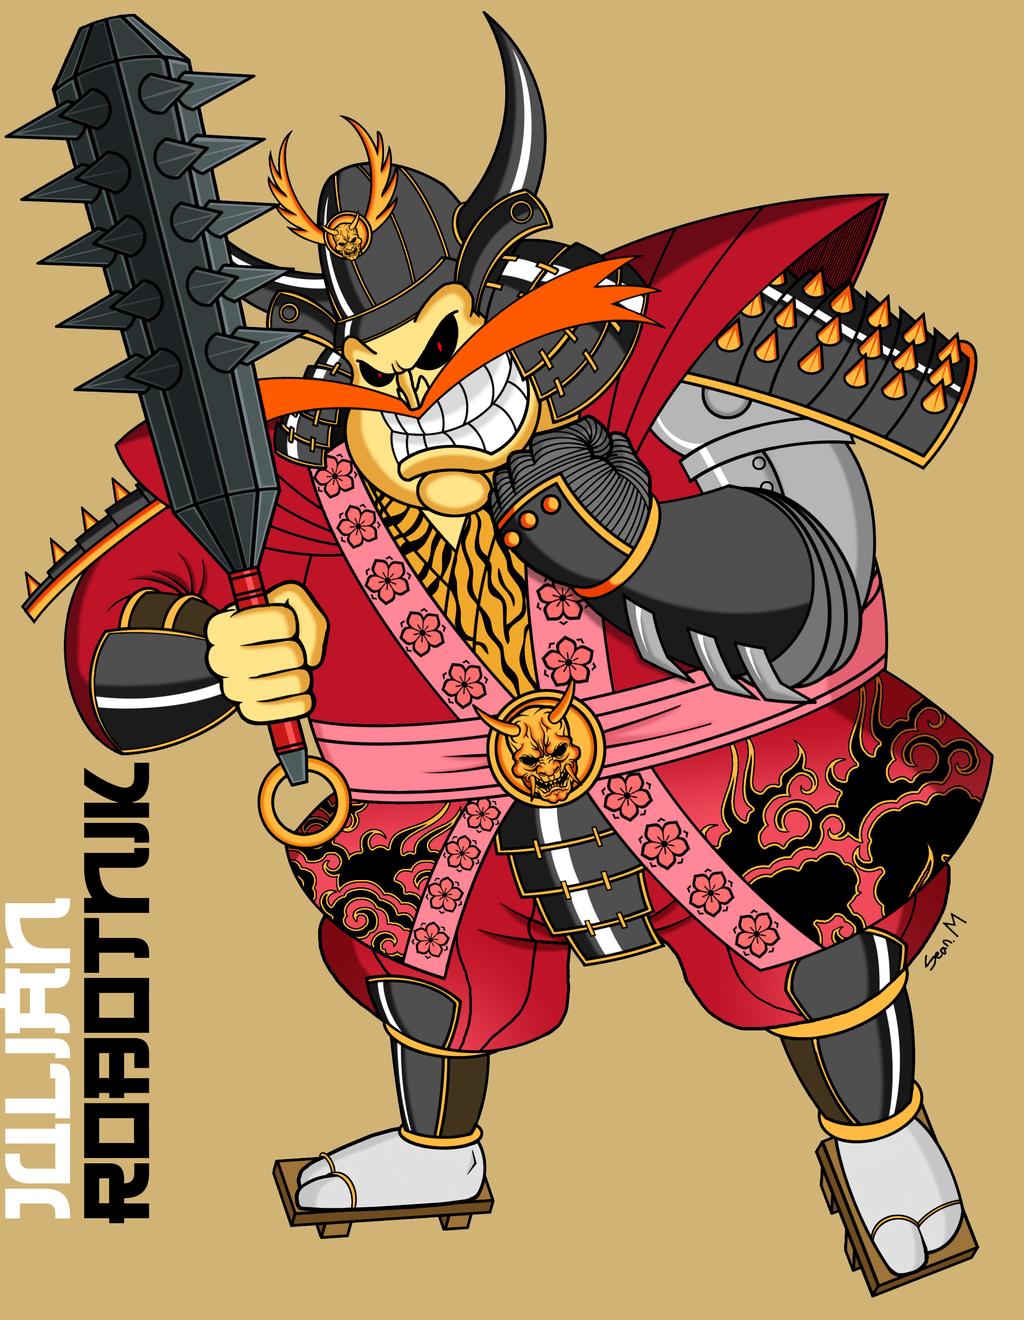 shogun_julian_robotnik_by_mobianmonster-